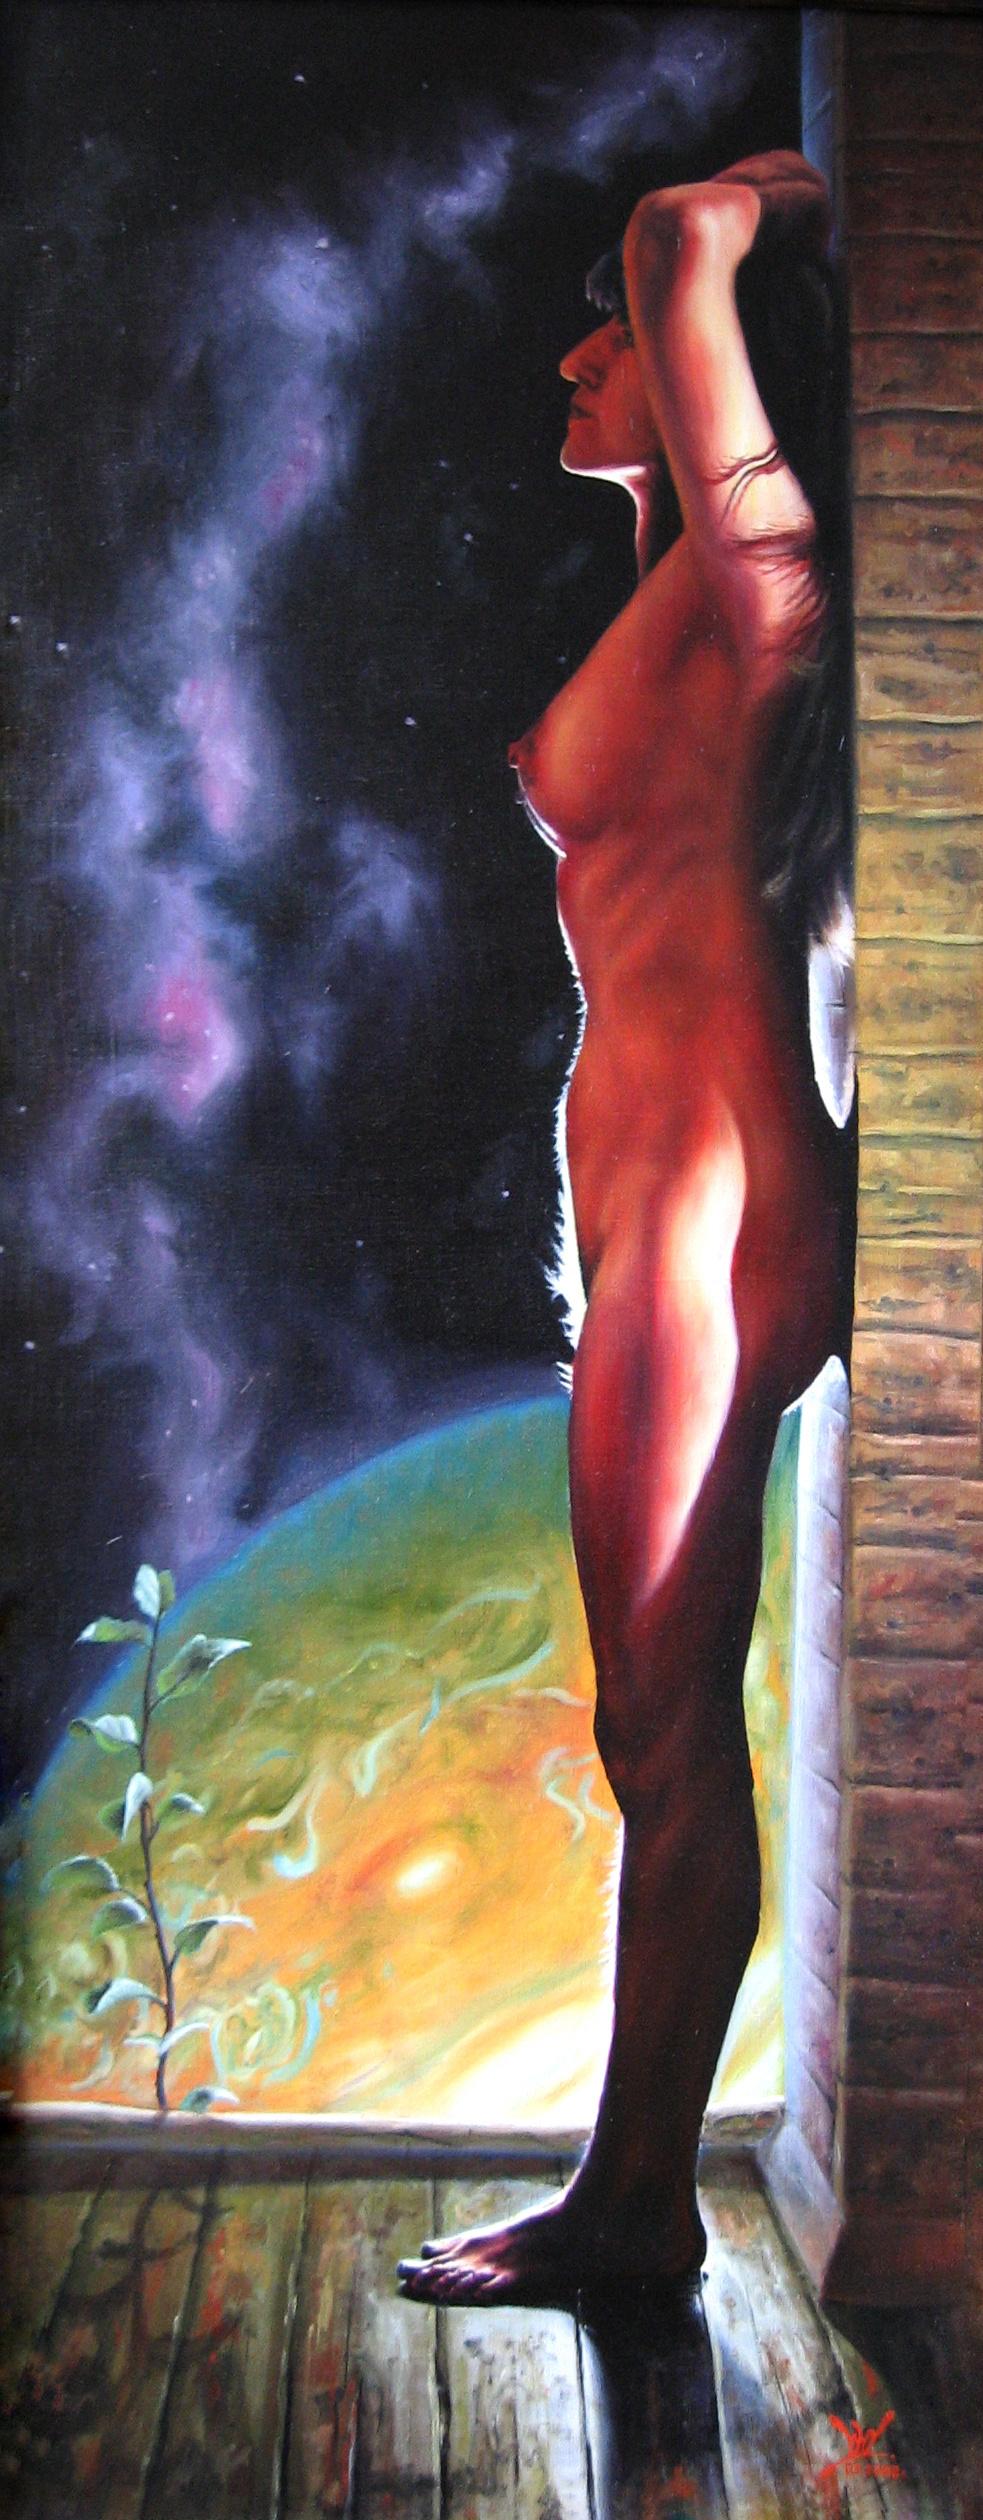 Вячеслав Юрьевич Шайнуров. On the threshold